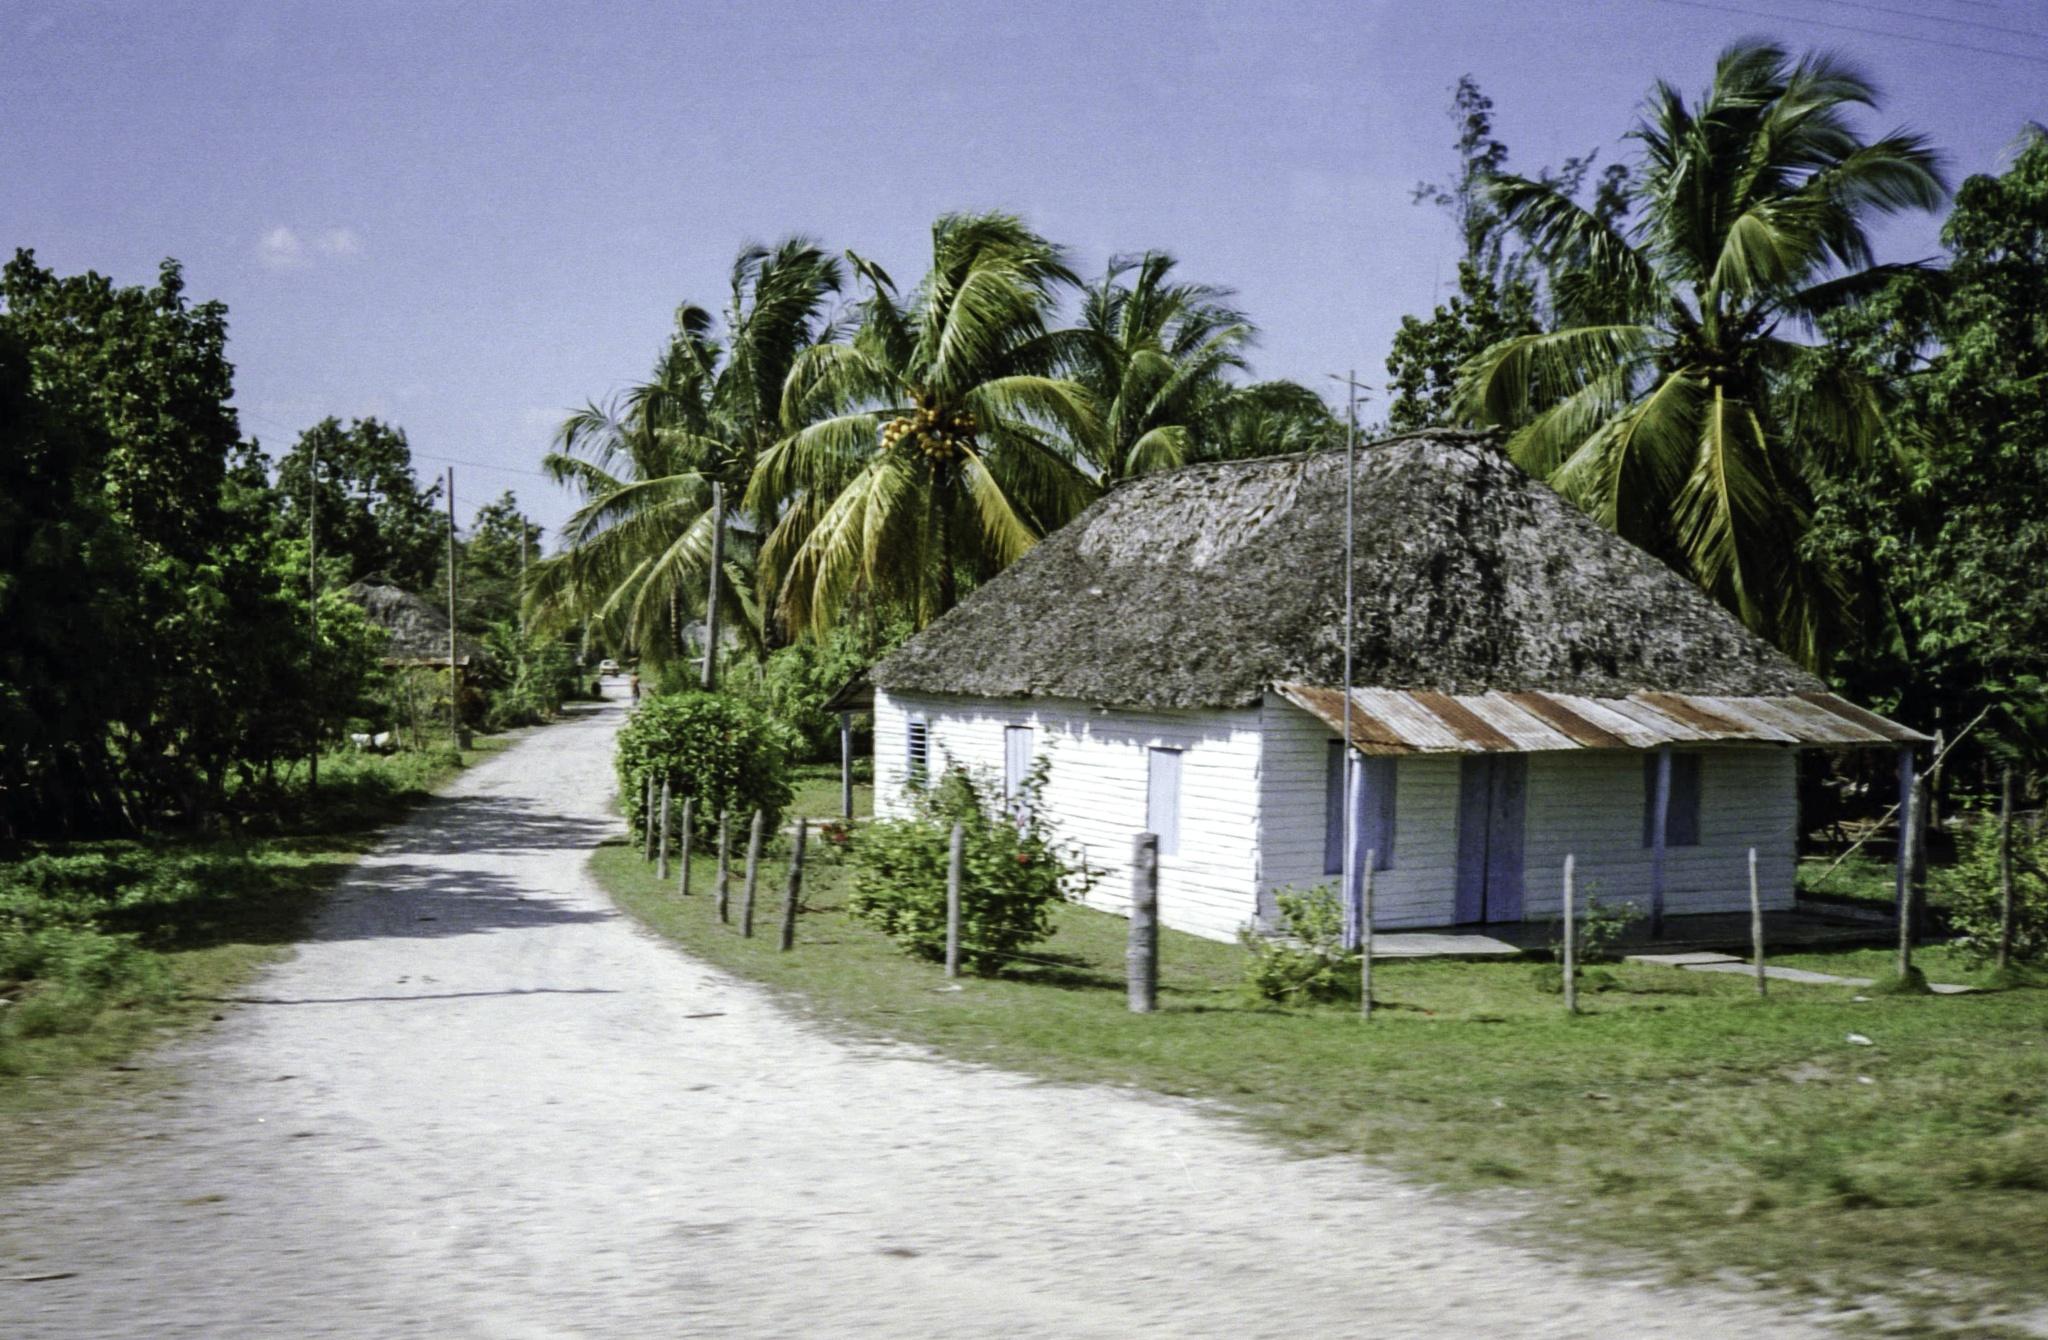 Cuba : house and coconuts, 1991 by Martine de Lajudie